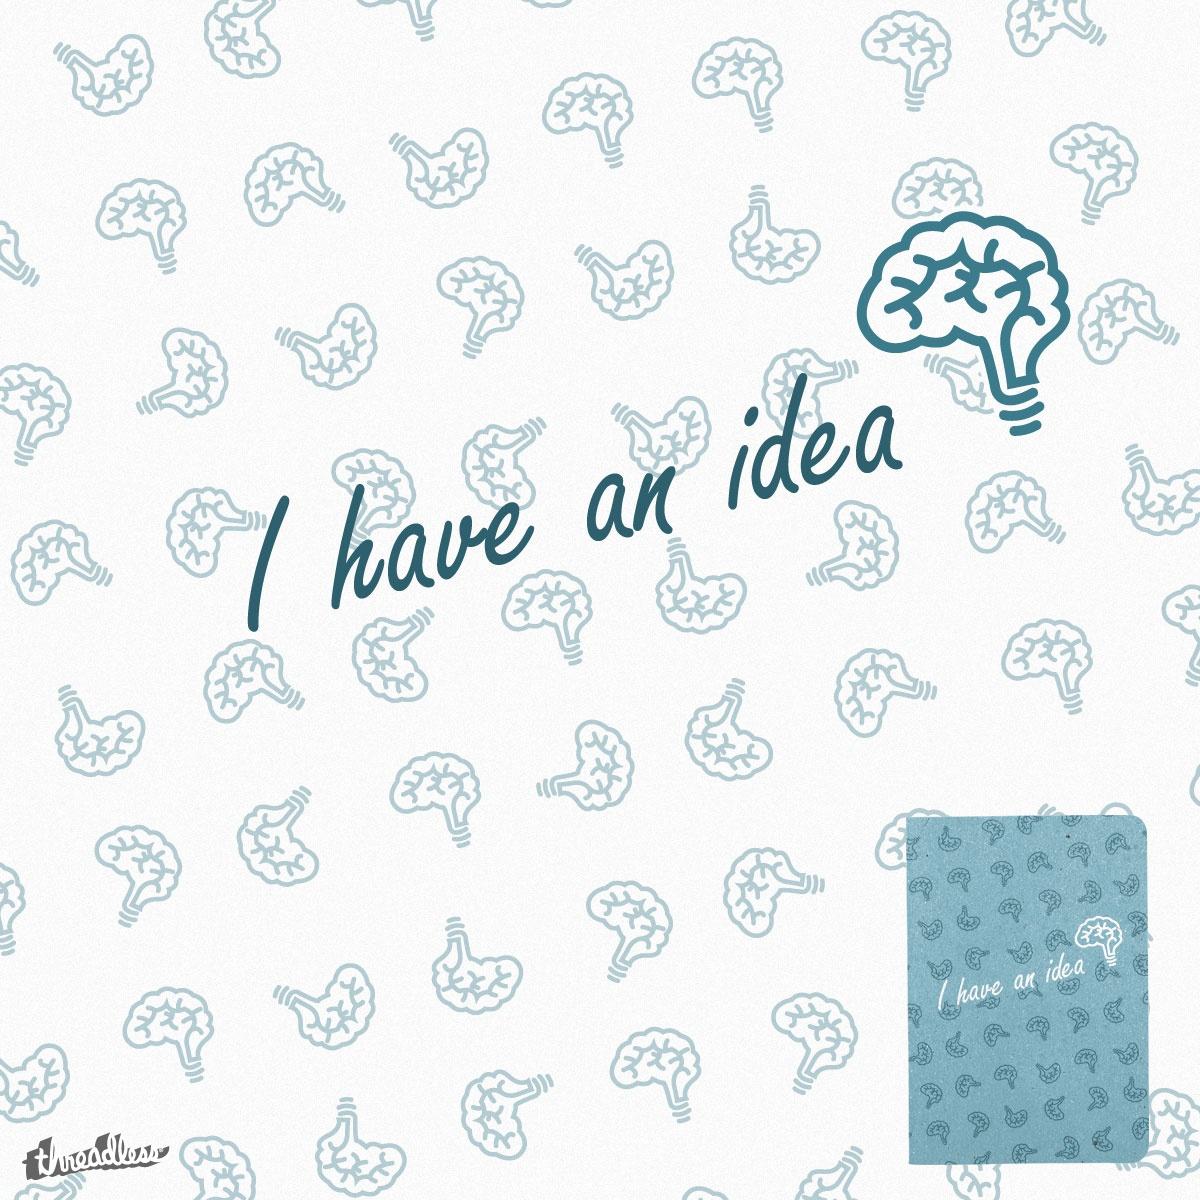 I Have a Idea by Alomensky on Threadless